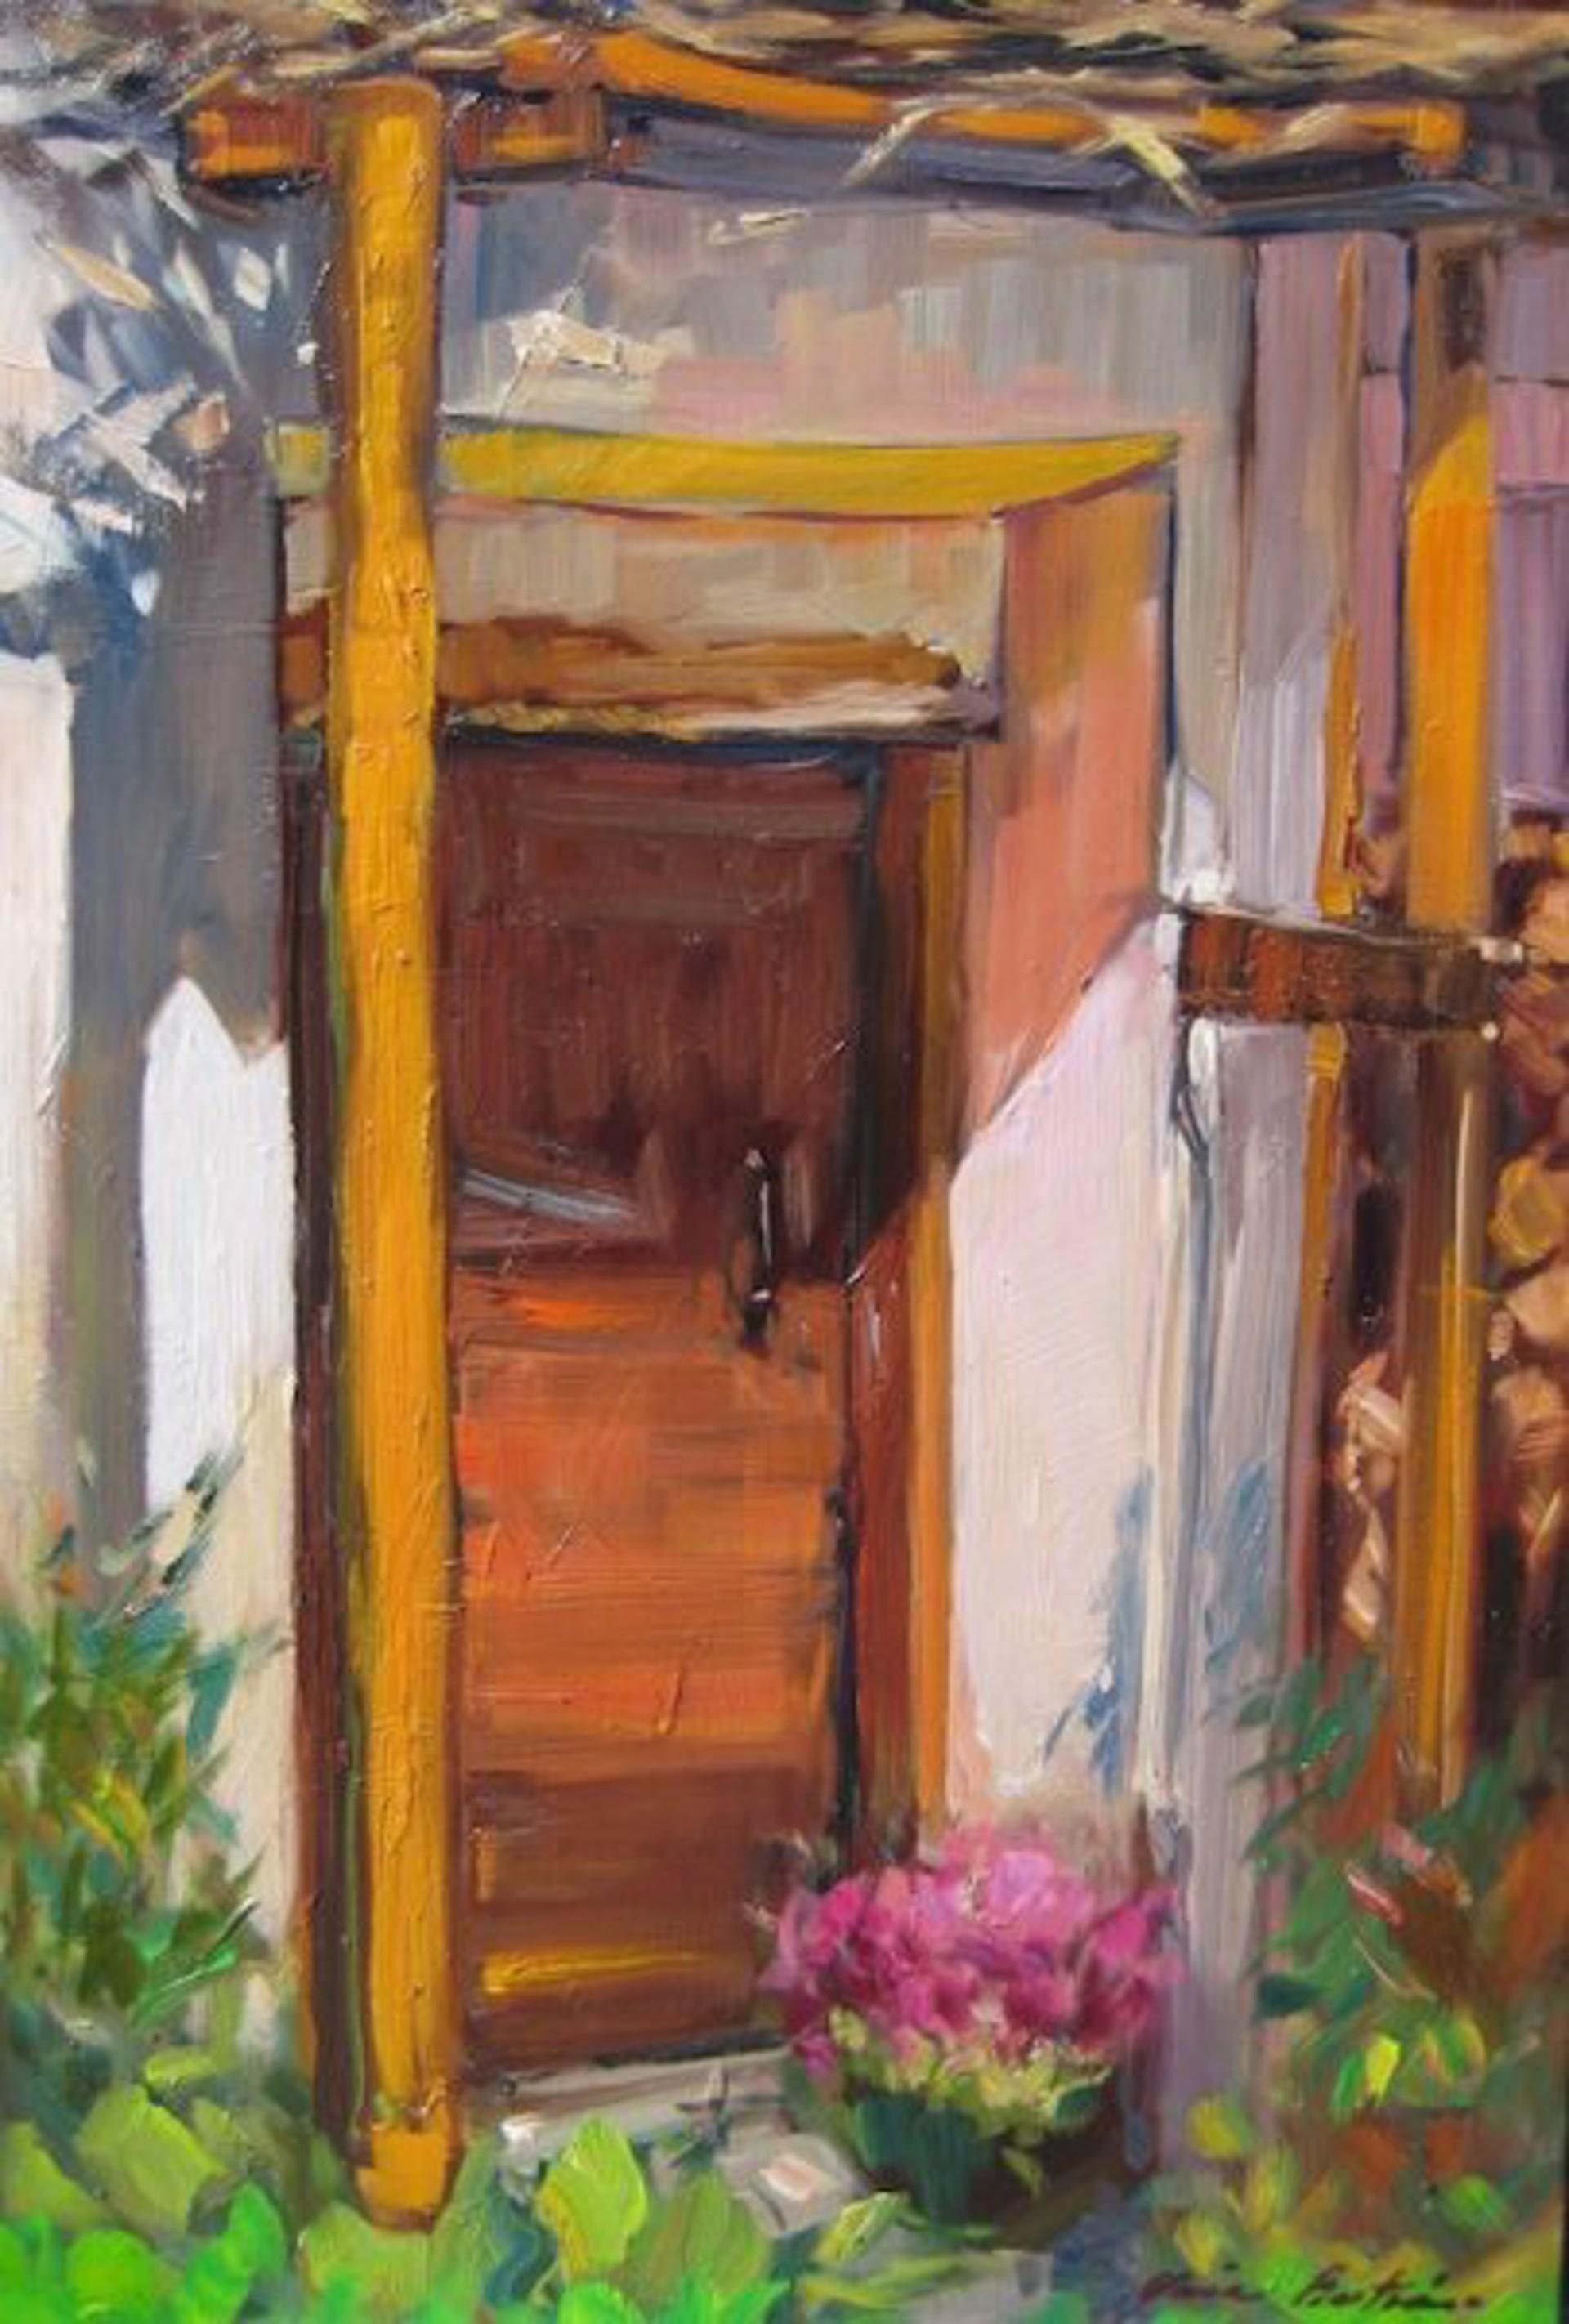 Barn Door In The Alps by Maria Bertrán